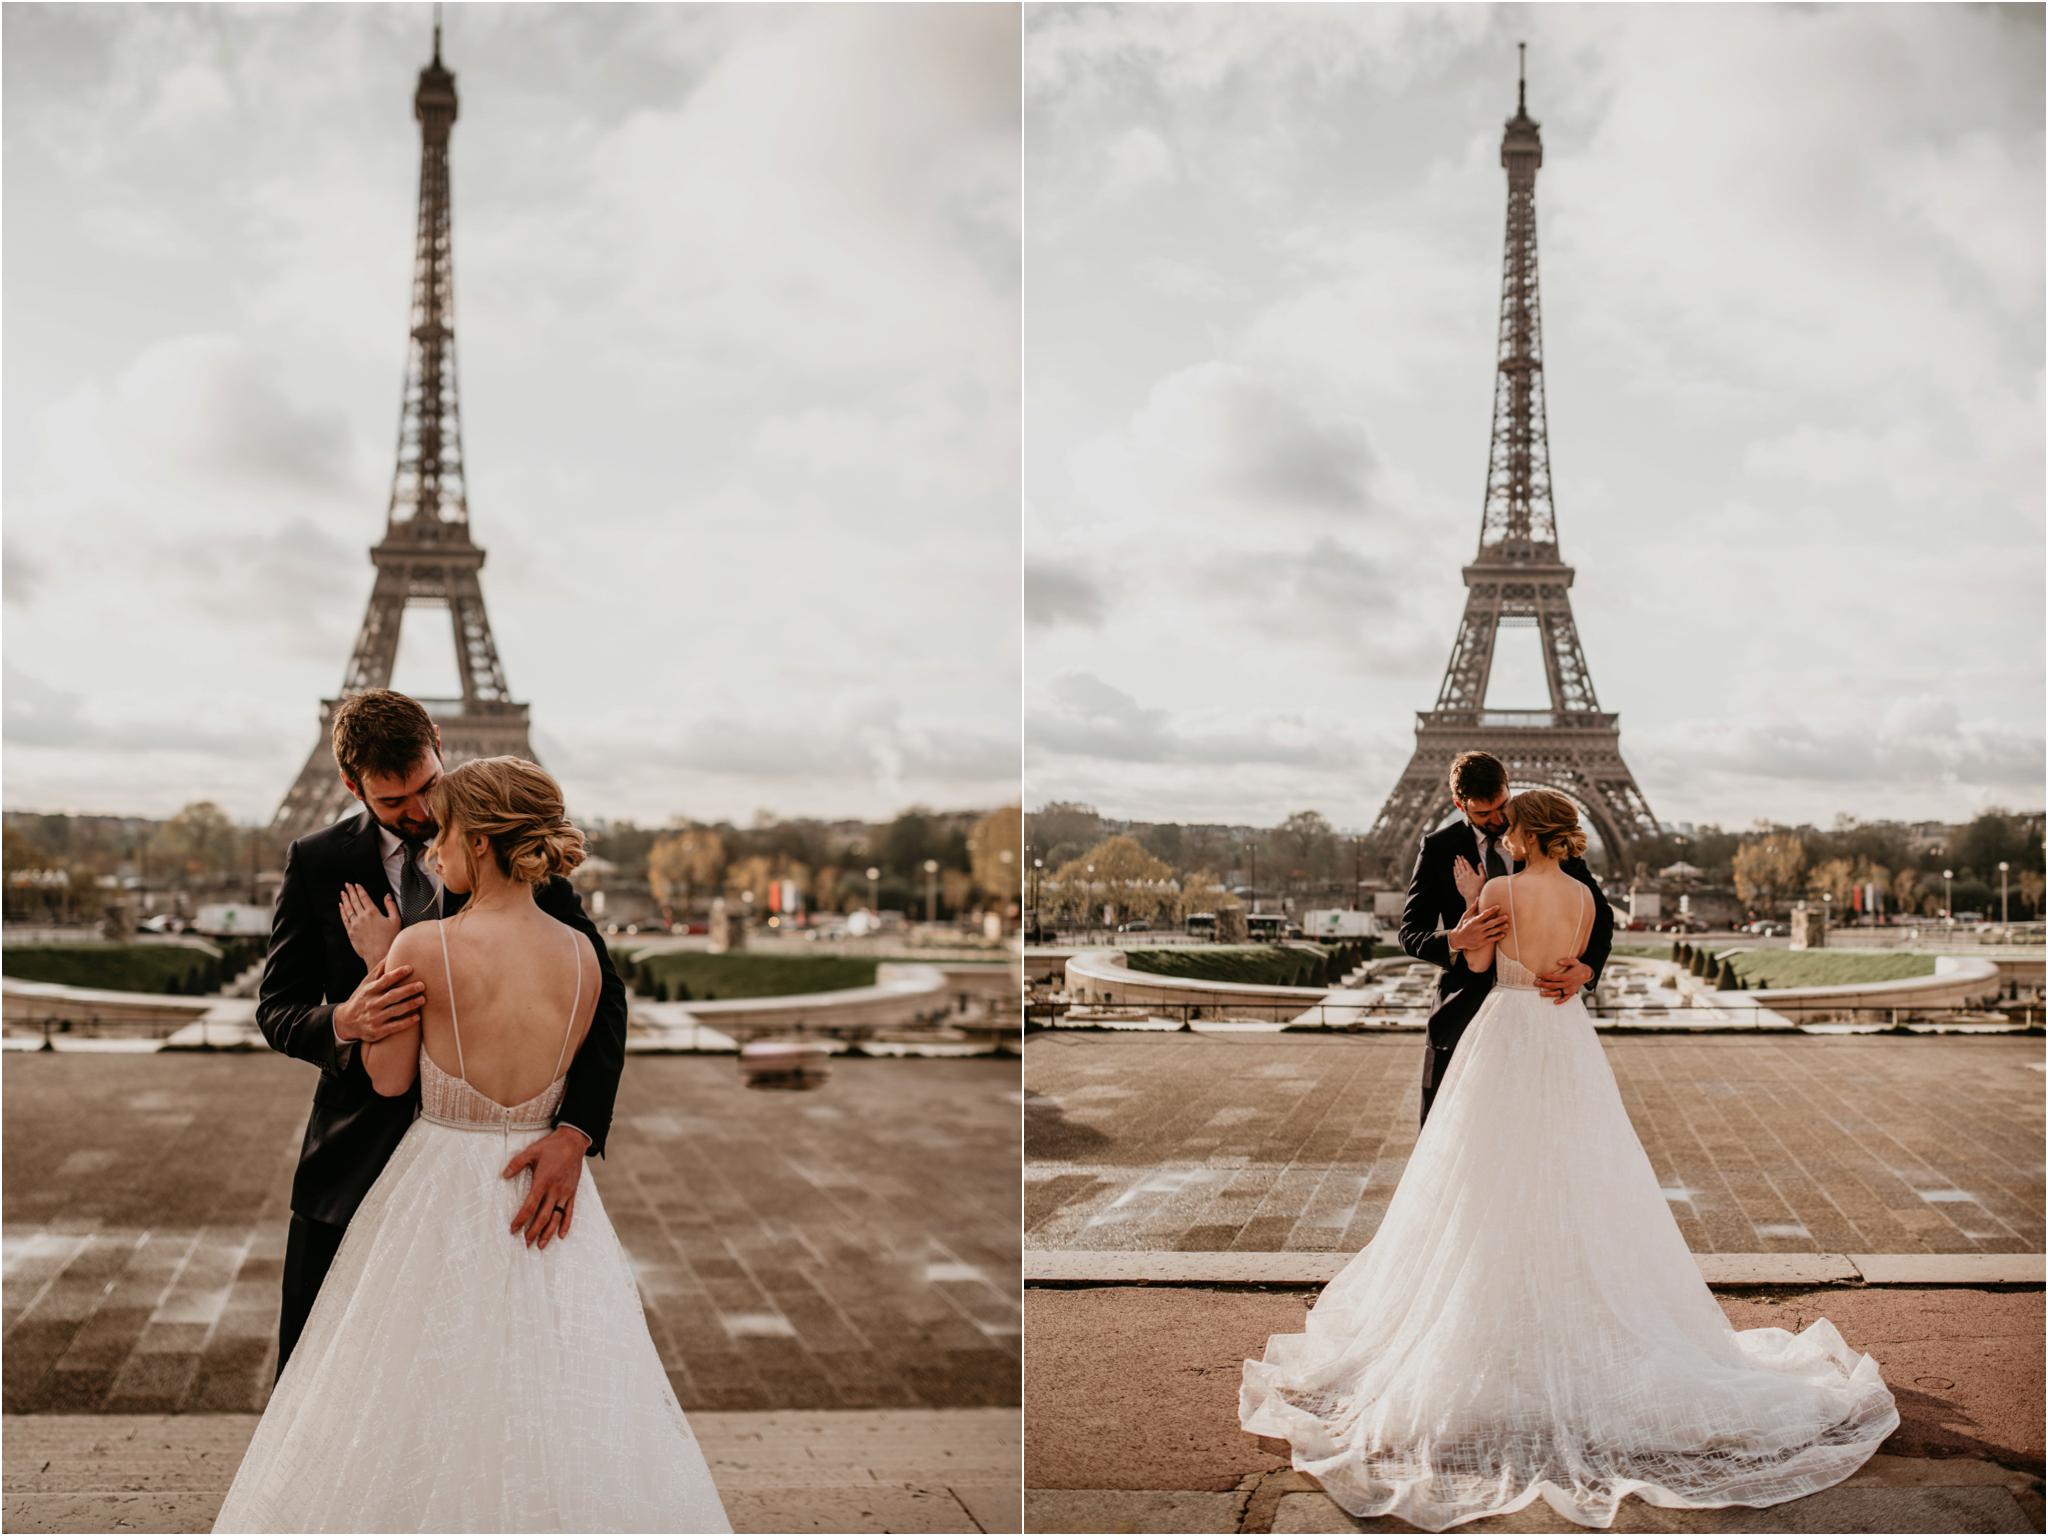 miranda-and-jared-paris-elopement-destination-wedding-photographer-062.jpg